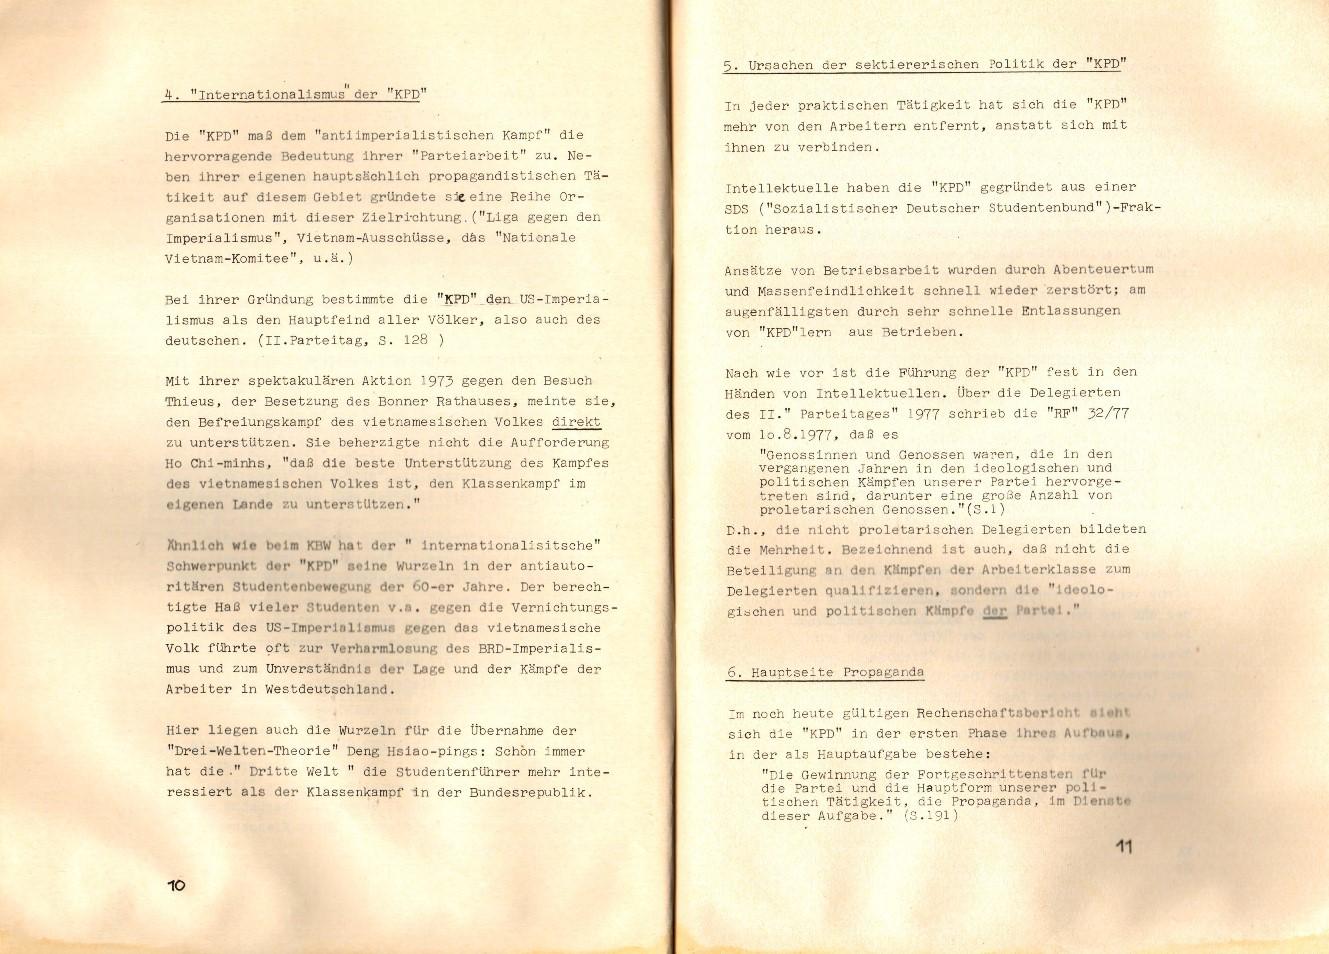 KABD_1978_Argumentationshilfen_07